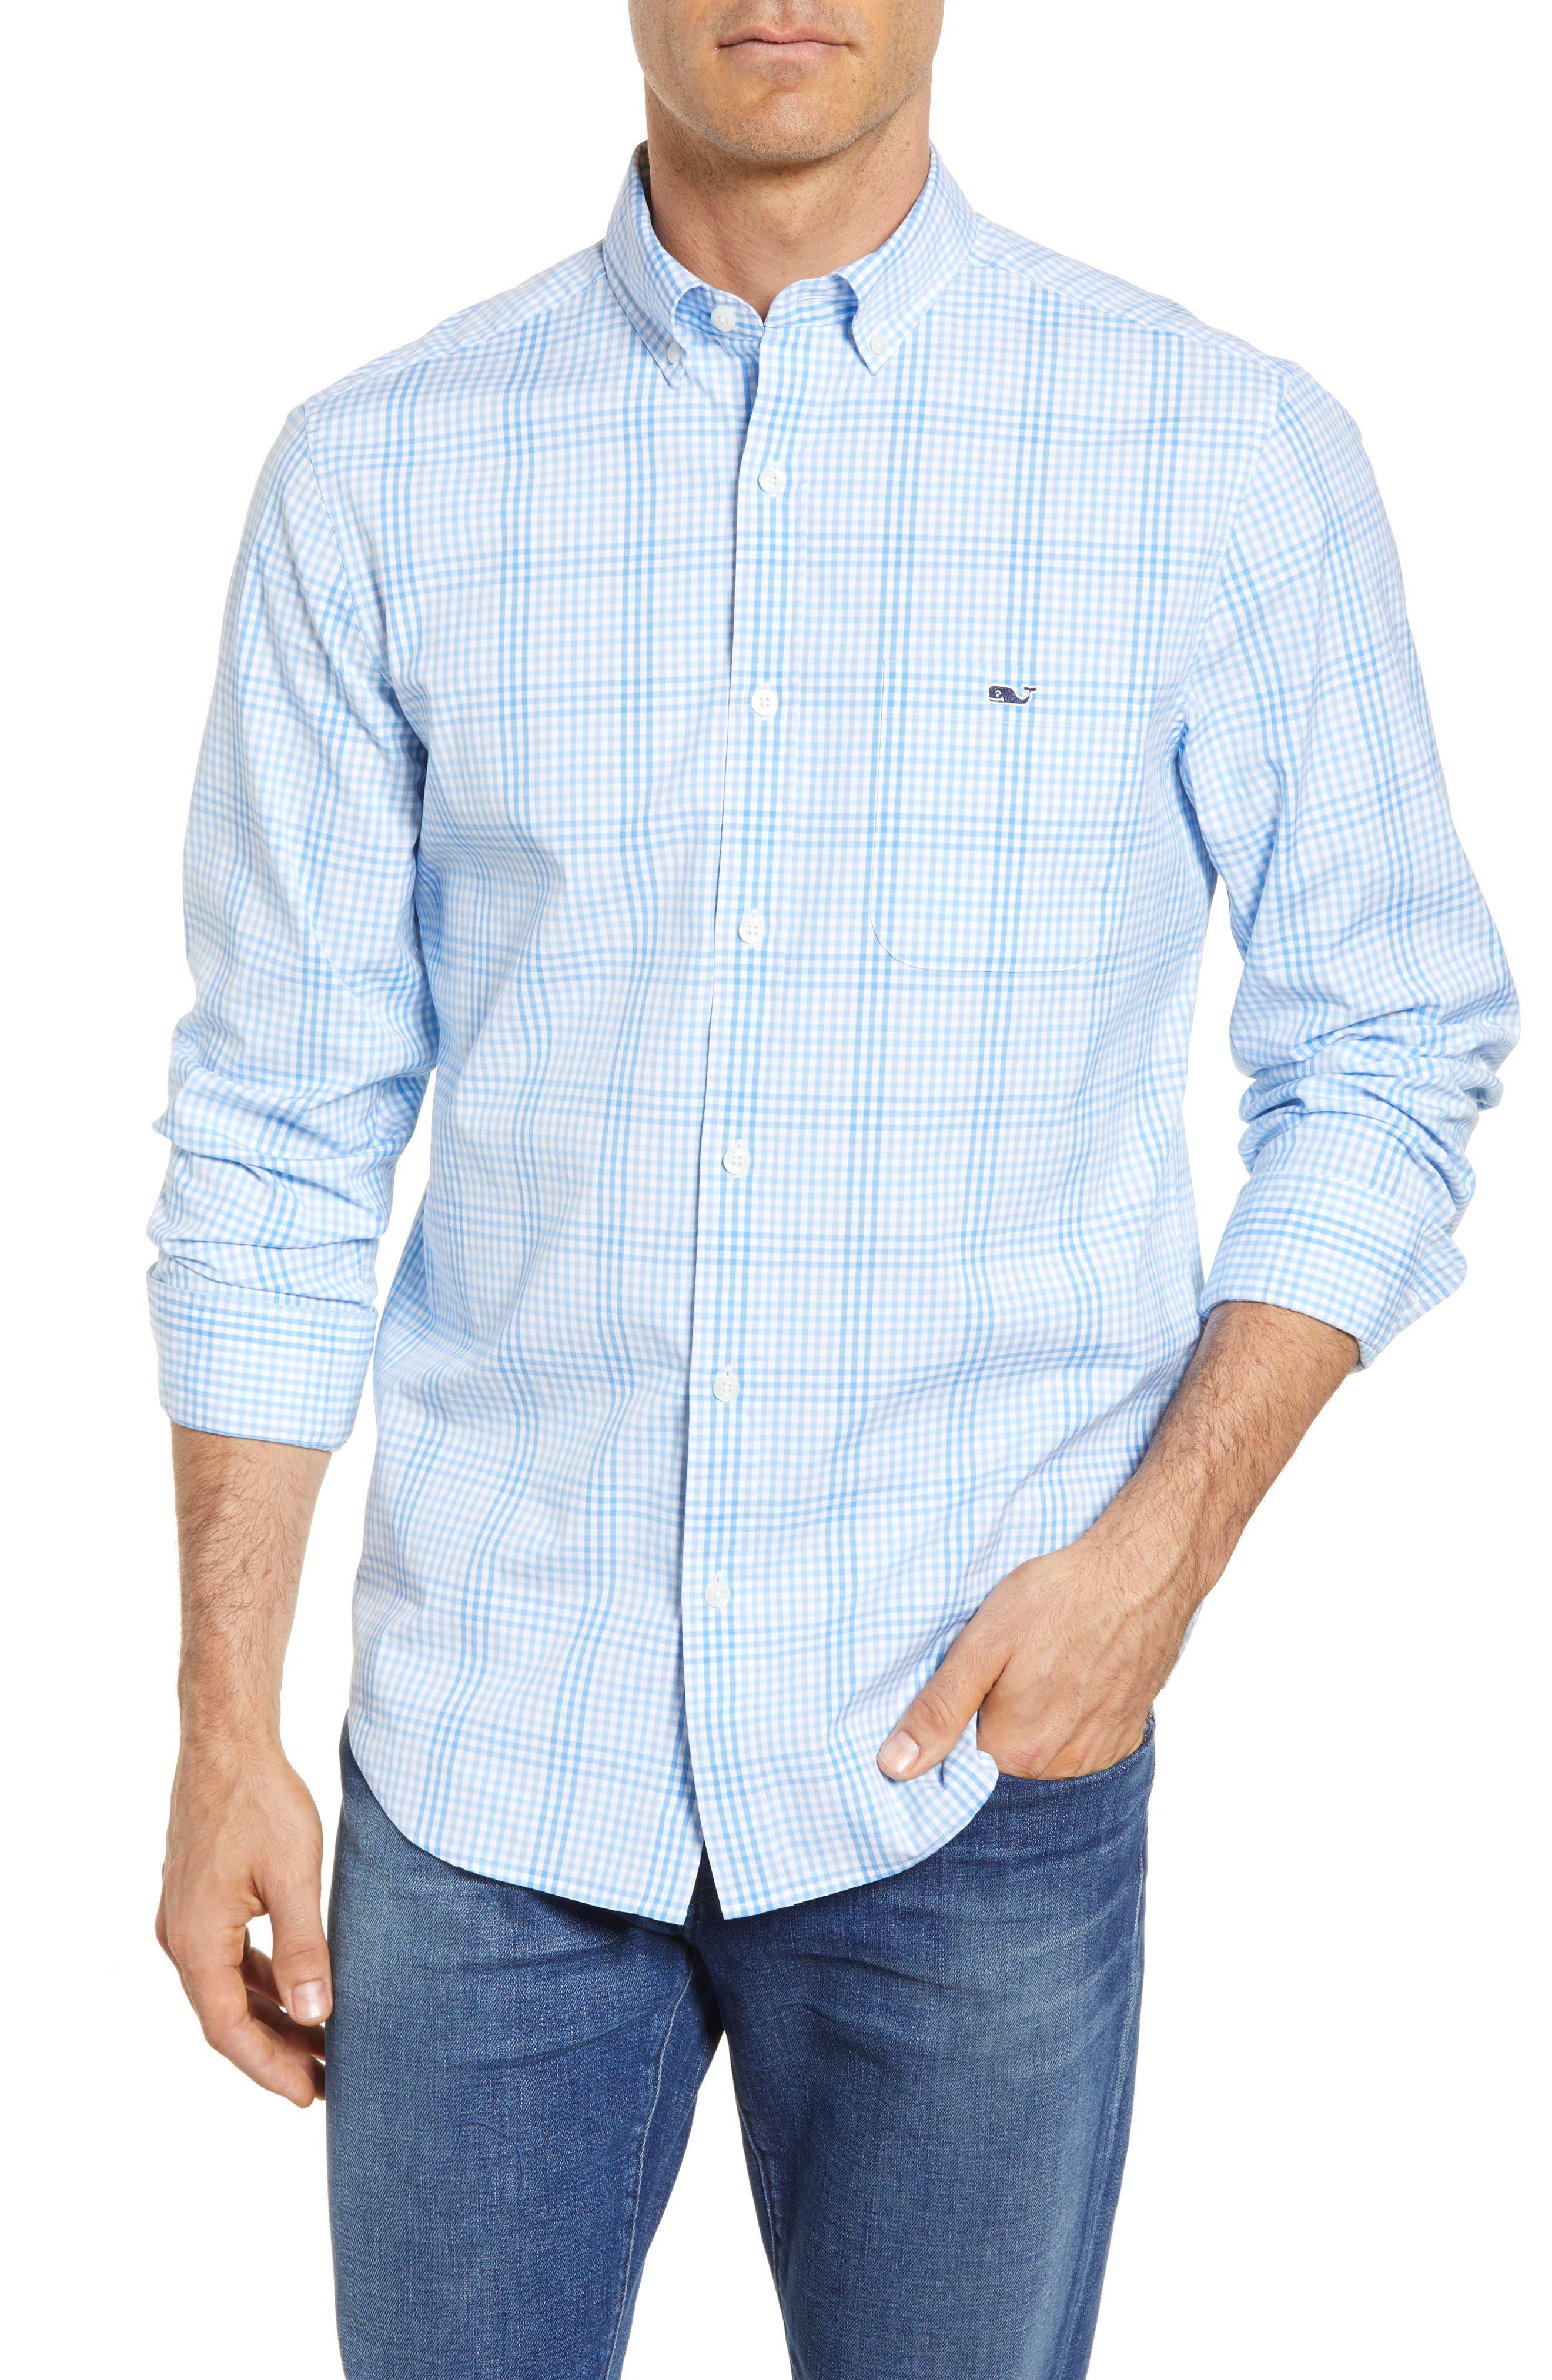 Ridge Hill Classic Fit Check Sport Shirt,                         Main,                         color, Harbor Cay